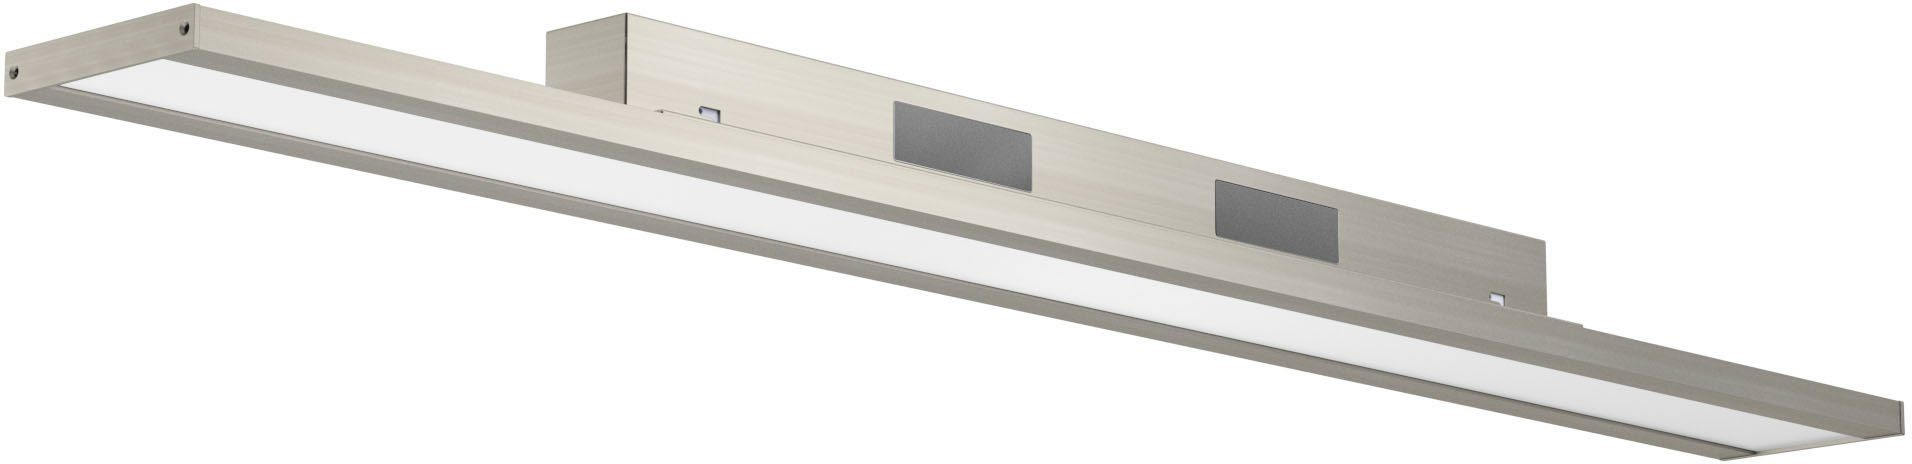 EVOTEC LED-Deckenleuchte, 1flg., »CLASSIC TEC BASIC«